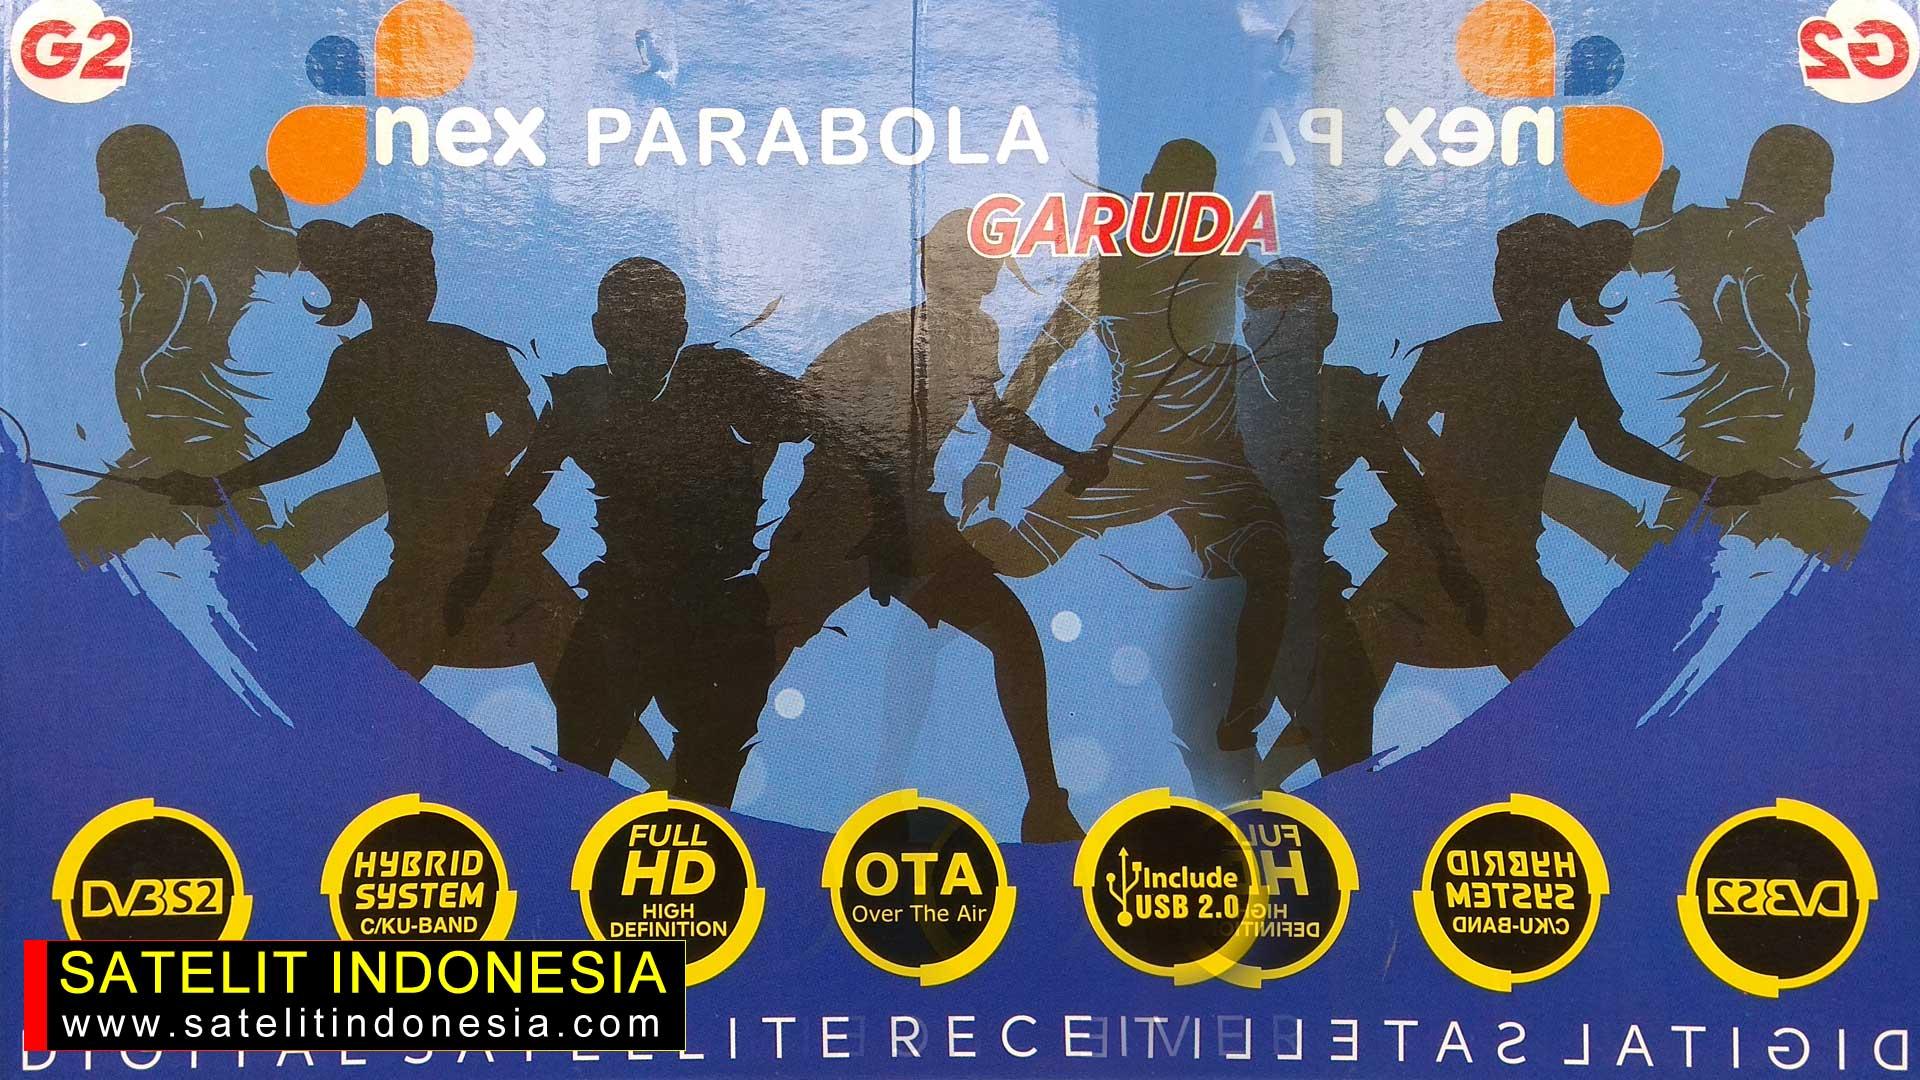 Spesifikasi Harga Nex Parabola Garuda G2 Terbaru